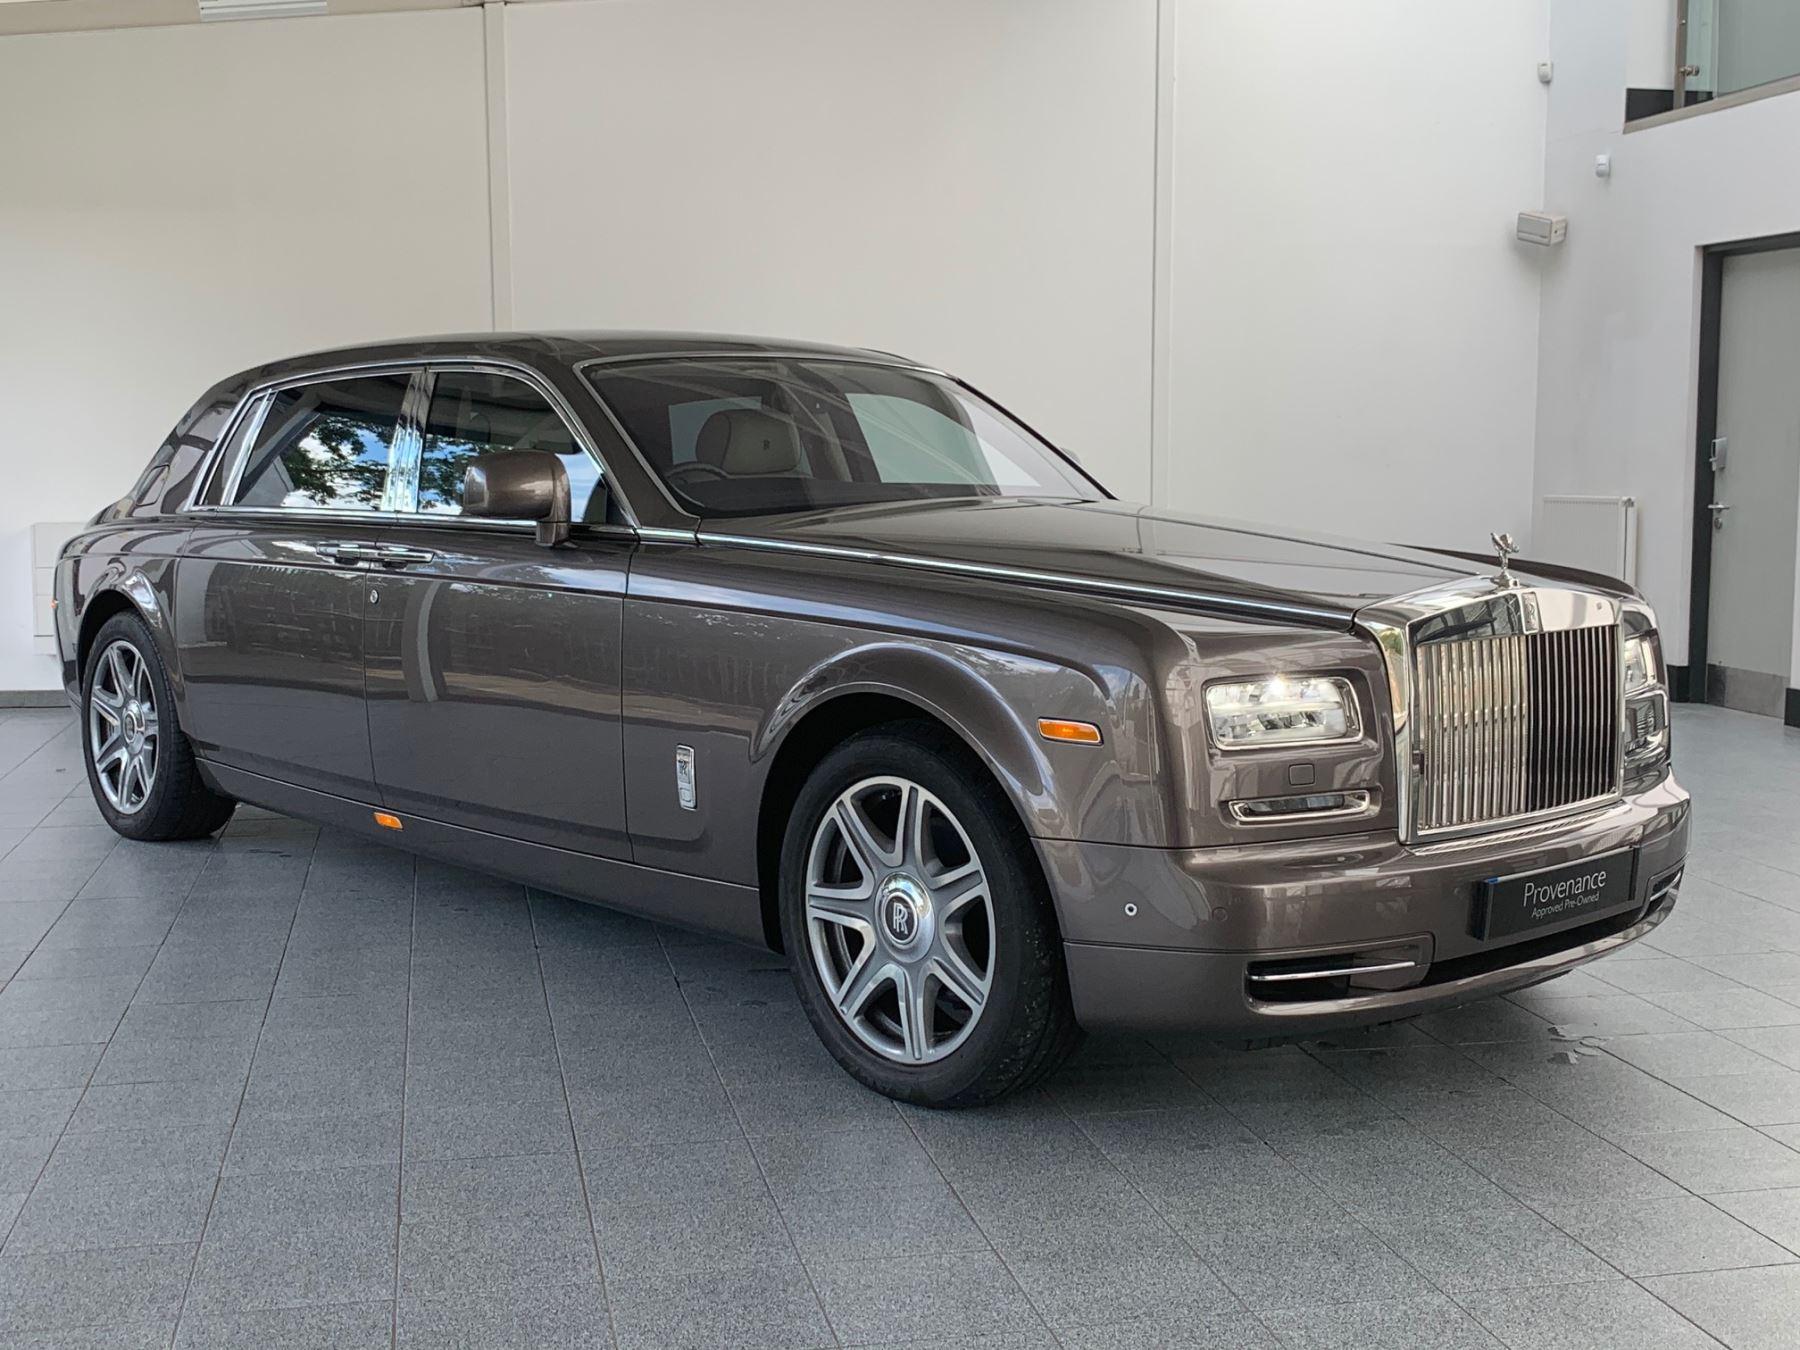 Rolls-Royce Phantom Extended Wheelbase II 4dr Auto EWB 6.7 Automatic Saloon (2014)